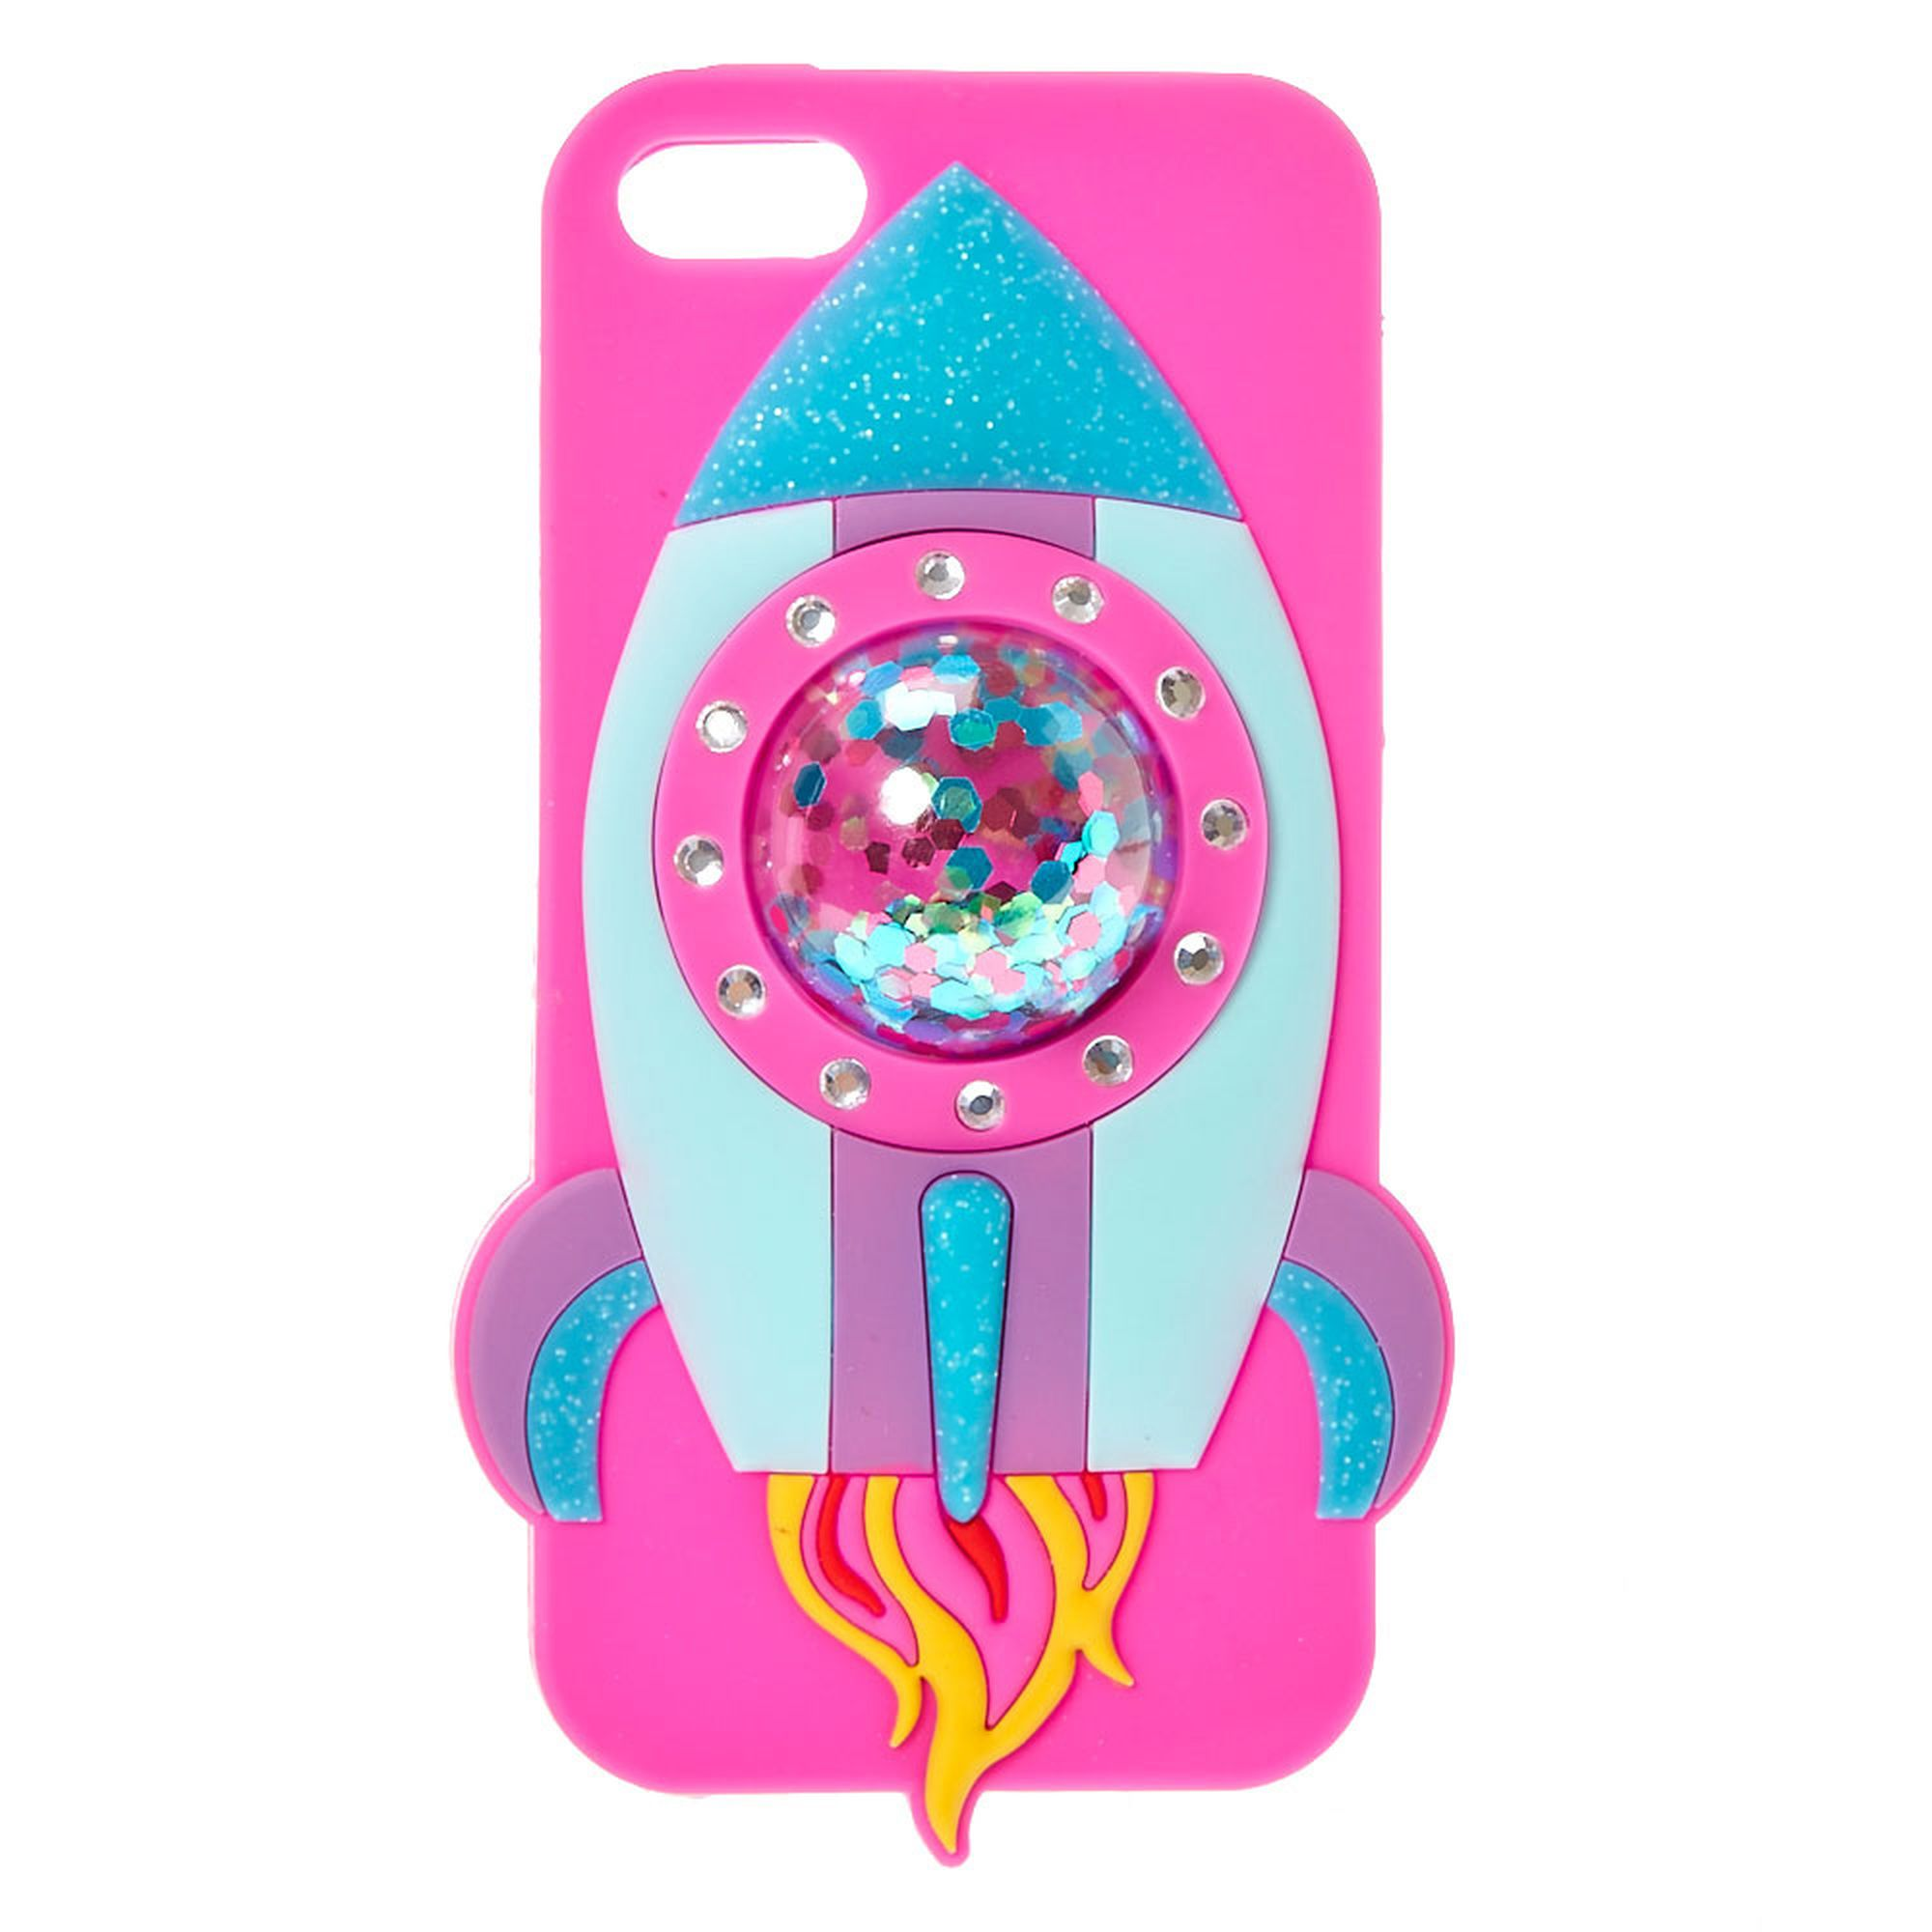 promo code 9aee4 1e6c3 Spaceship Silicone Phone Case | Claire's US | E L E C T R O N I C S ...